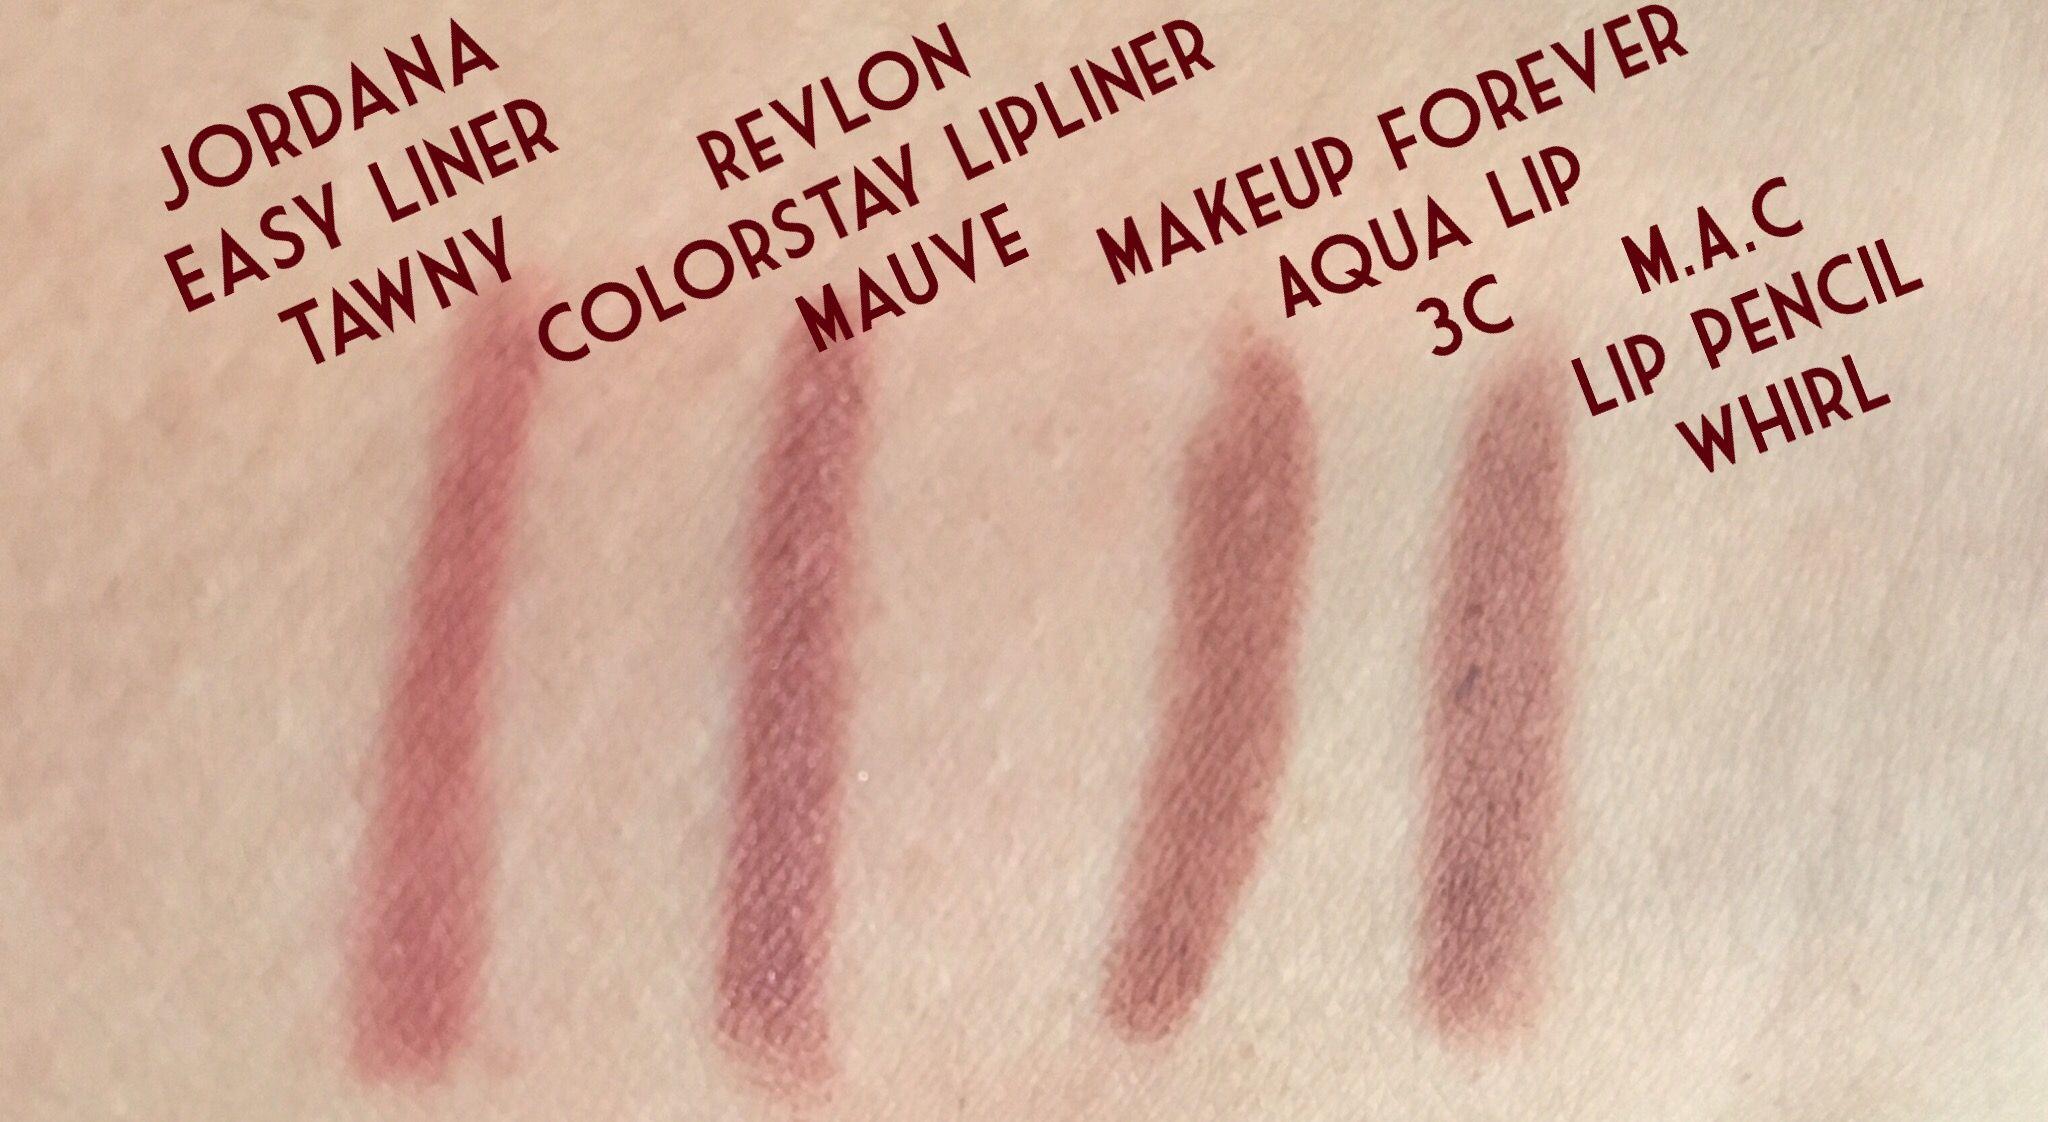 ColorStay Lipliner by Revlon #6